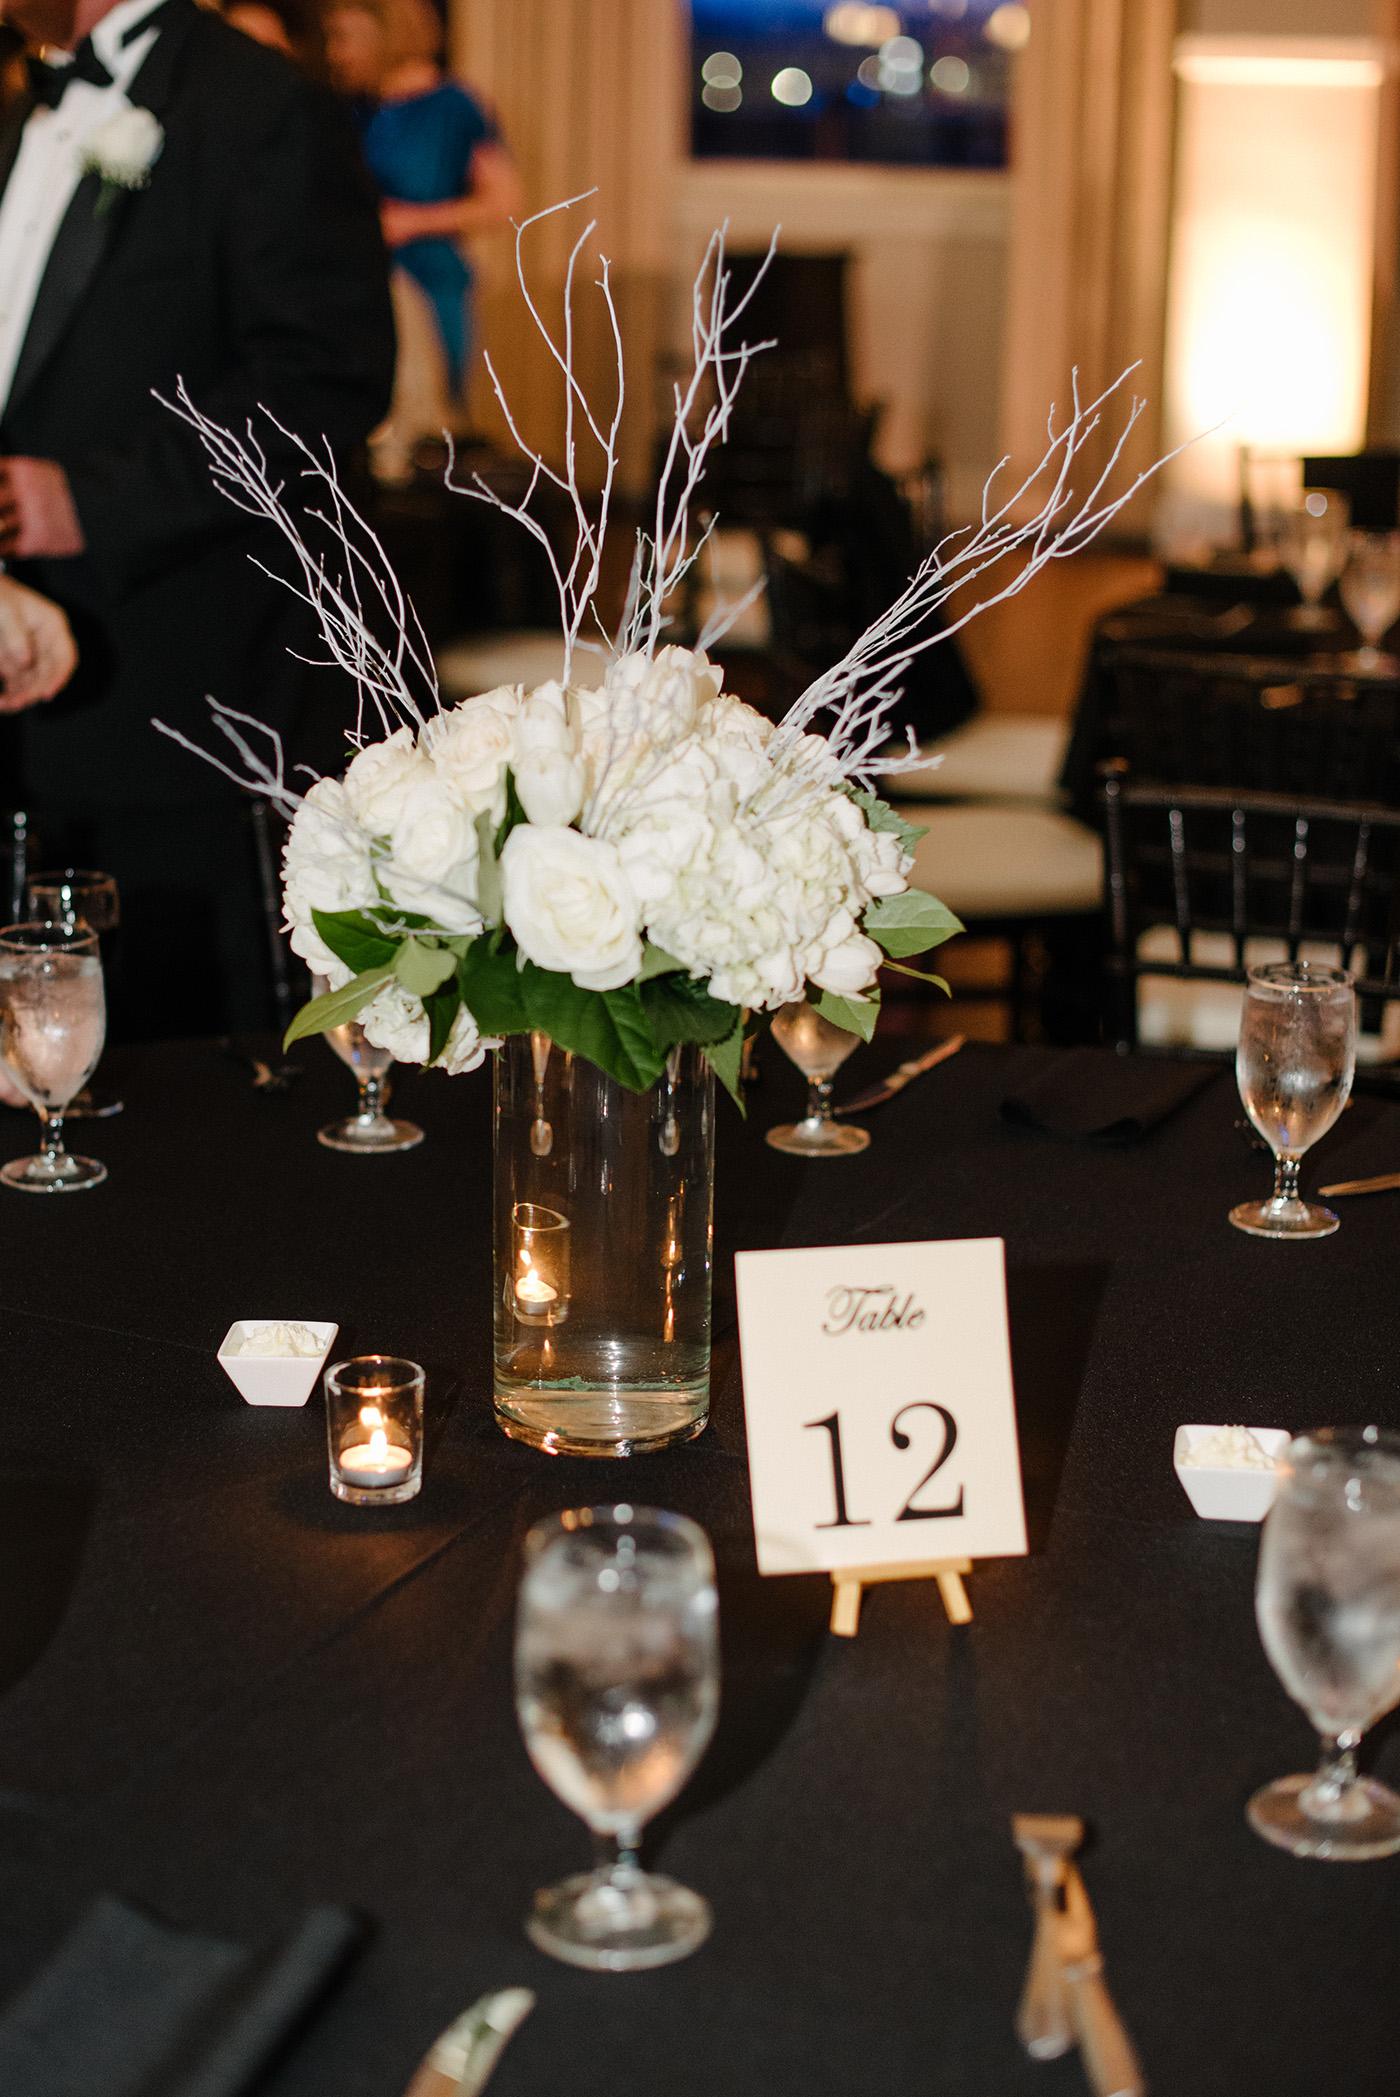 Dallas Wedding Planner - Winter Wedding at The Room on Main - Allday Events - 25.jpg